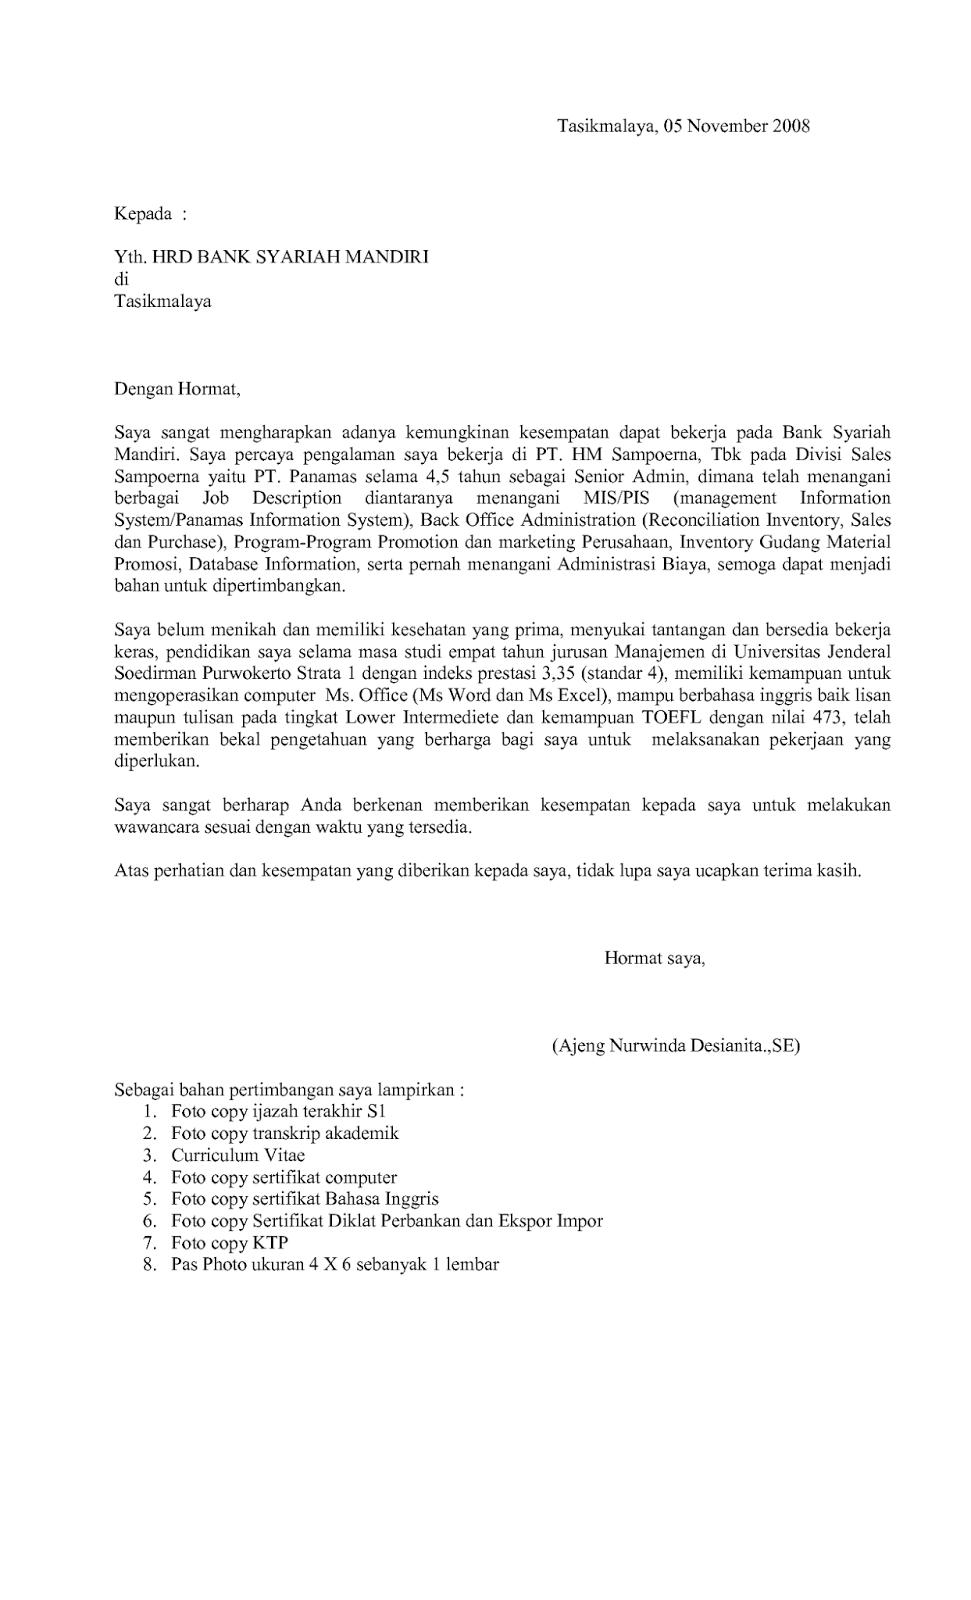 Surat Lamaran Kerja ODP Mandiri Ben Jobs